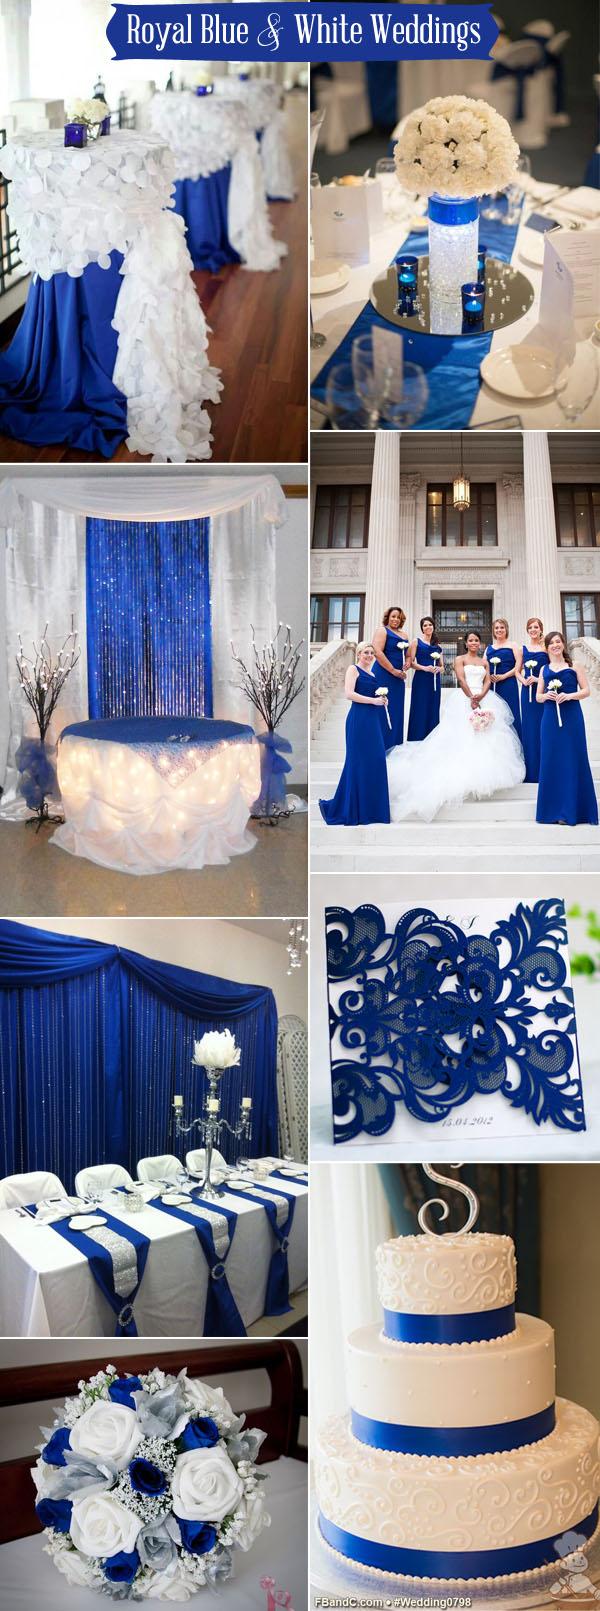 Ten Prettiest Shades of Blue for 2017 Wedding Color Ideas  Elegantweddinginvitescom Blog